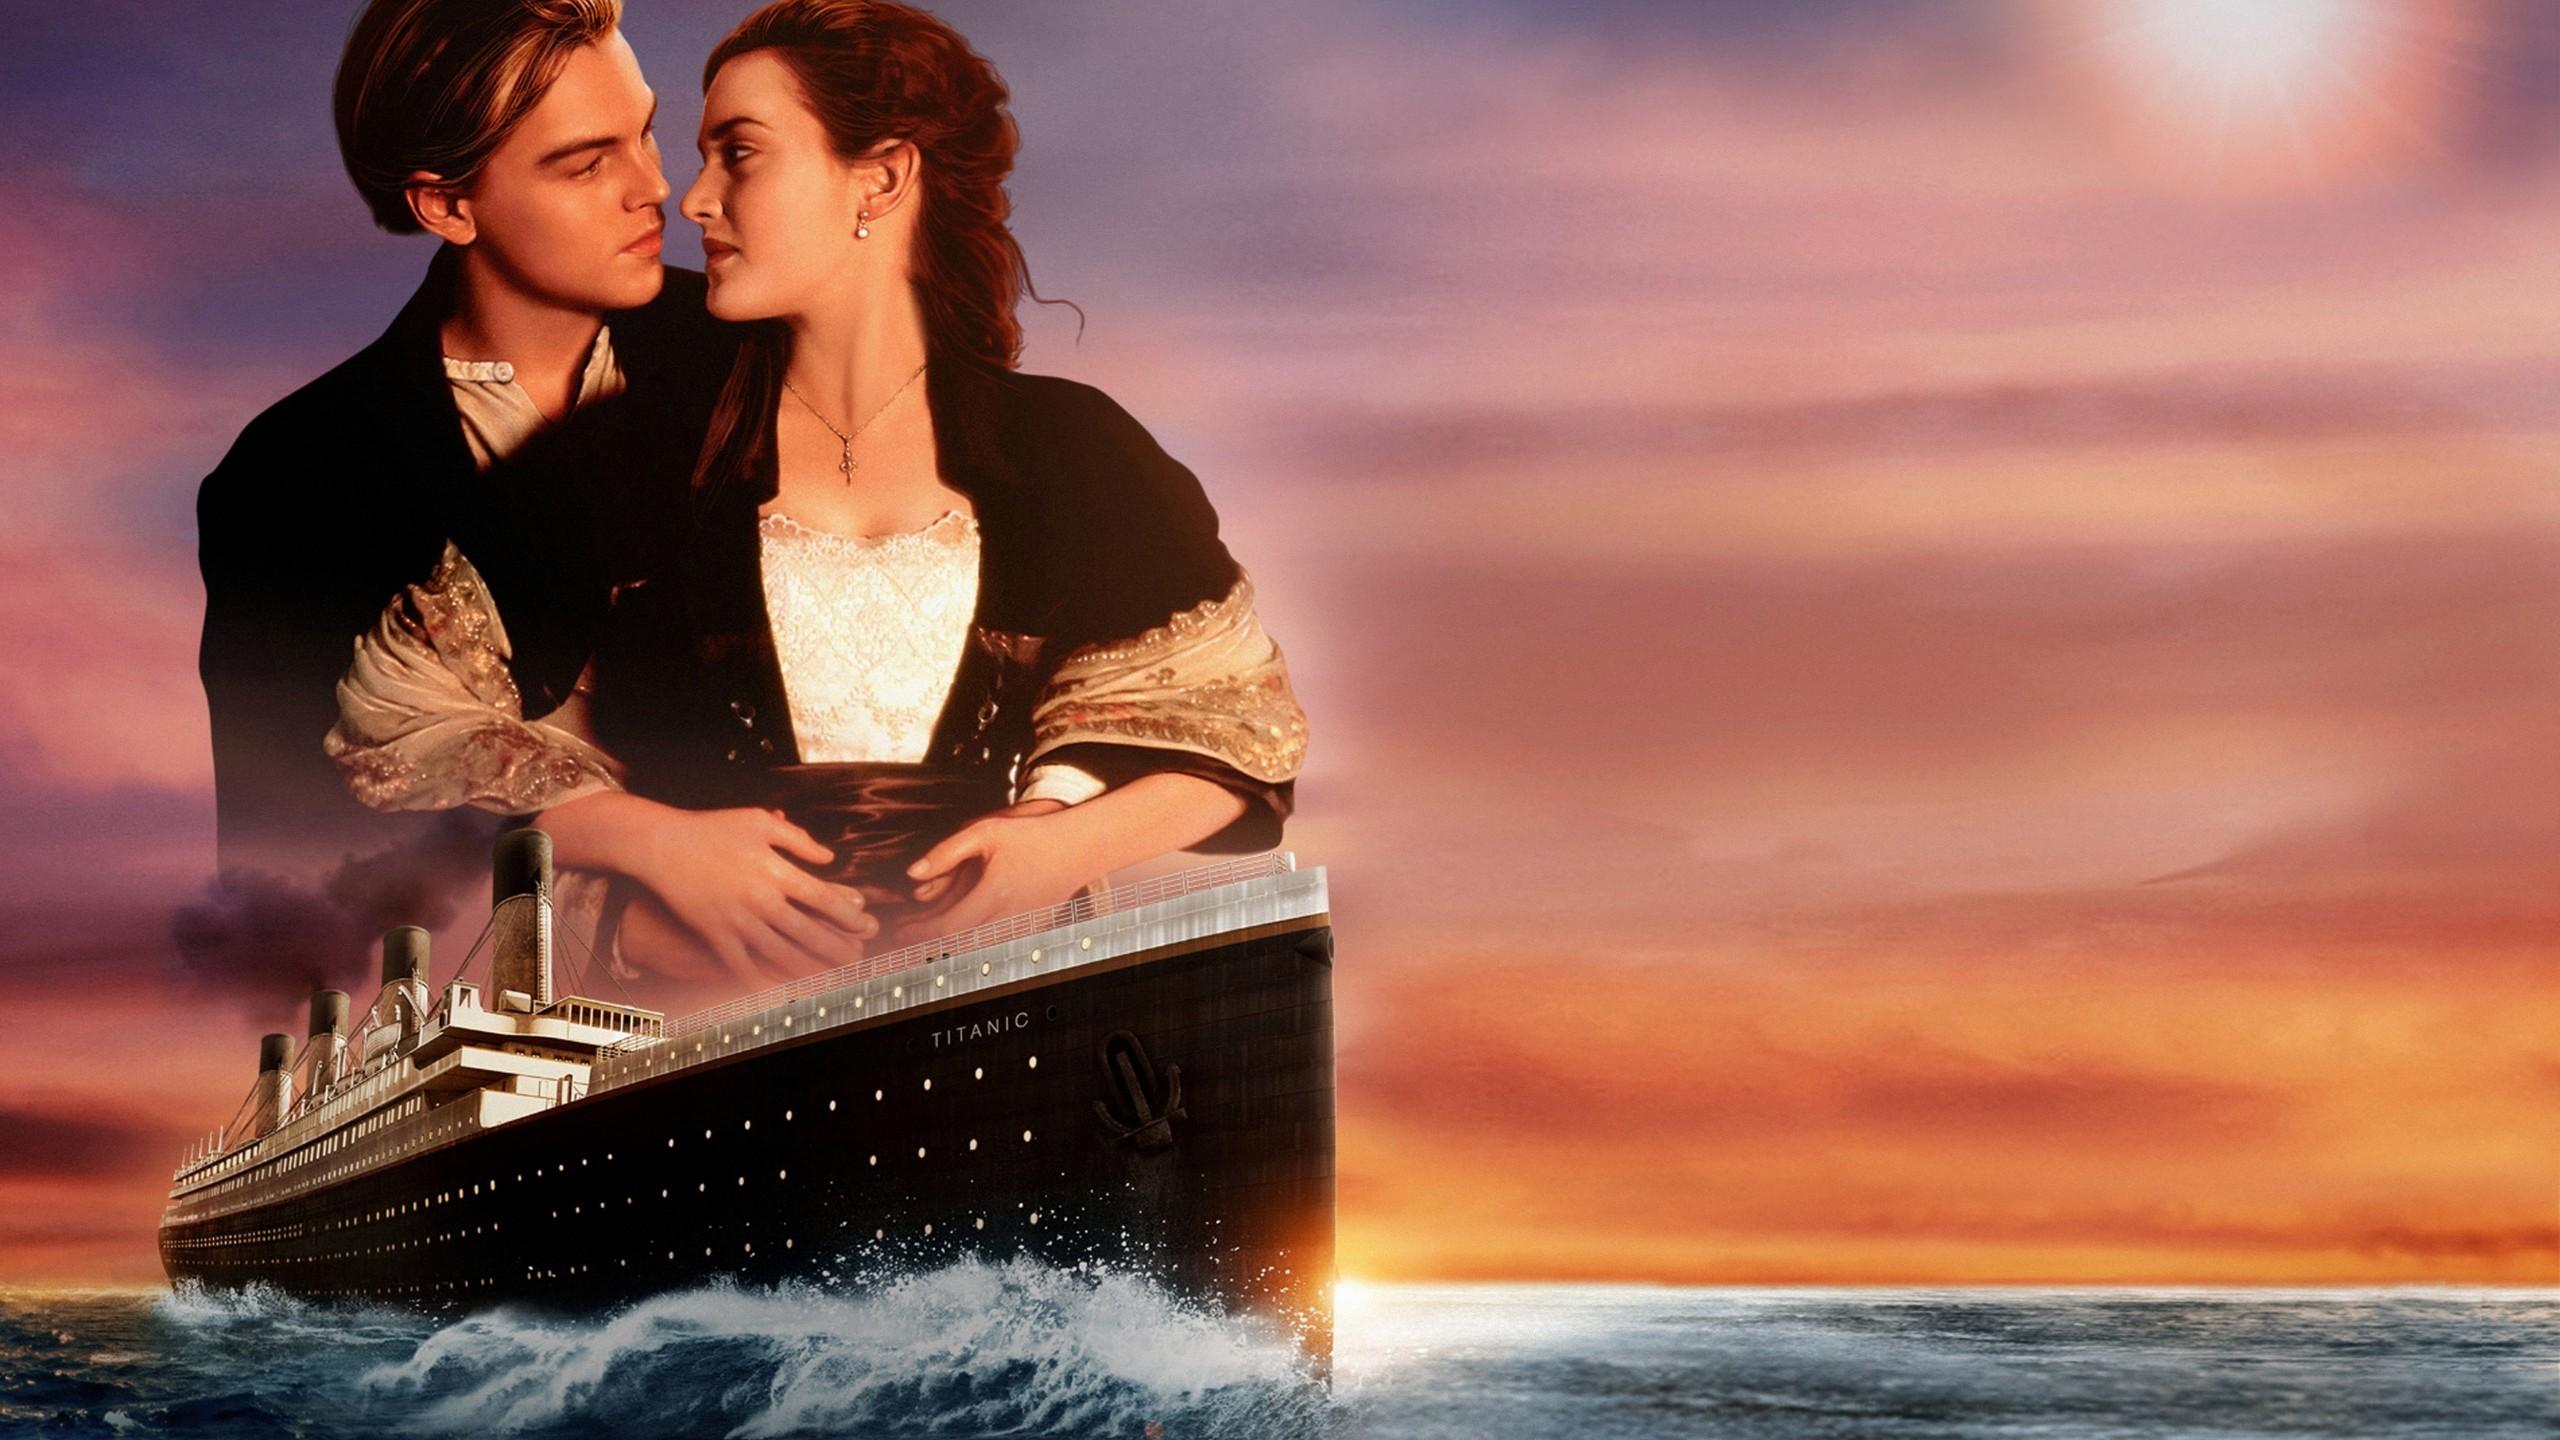 Titanic Wallpaper (77+ images)